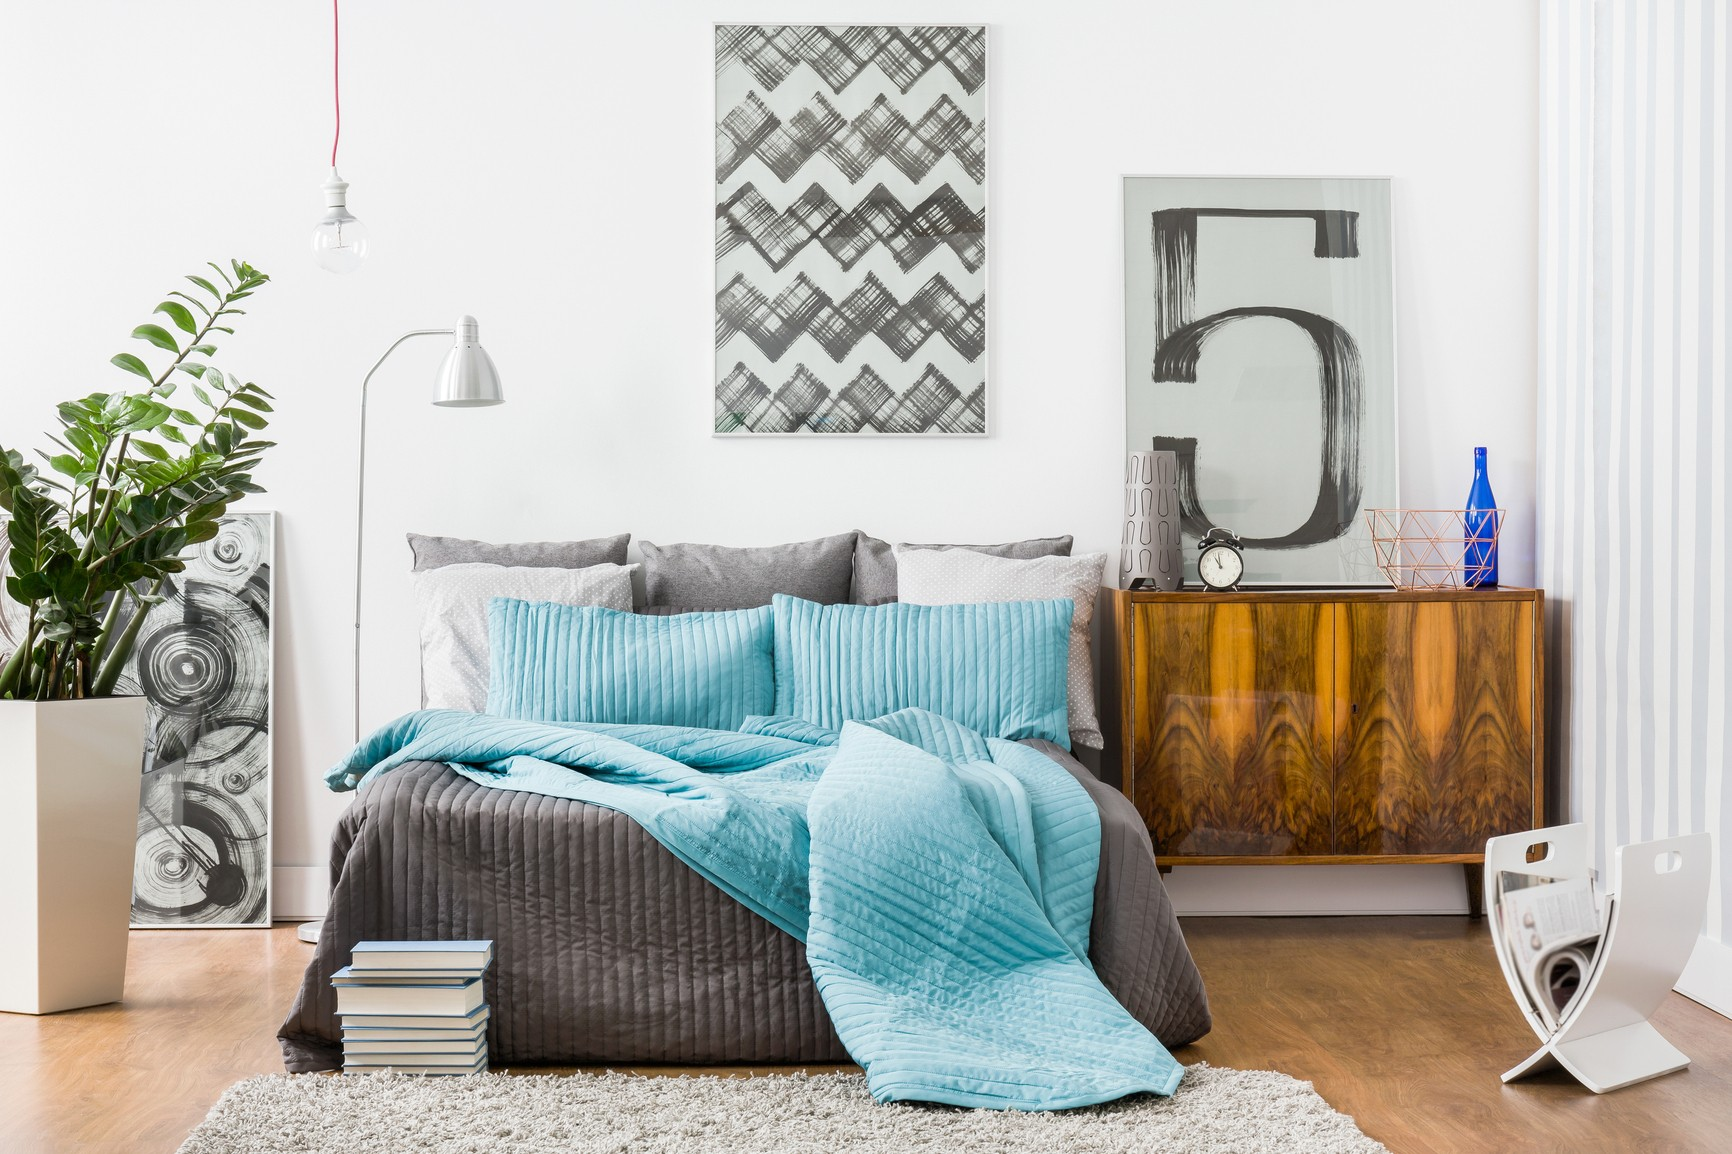 Bella Vista Apartments & Townhomes Houston see reviews pics